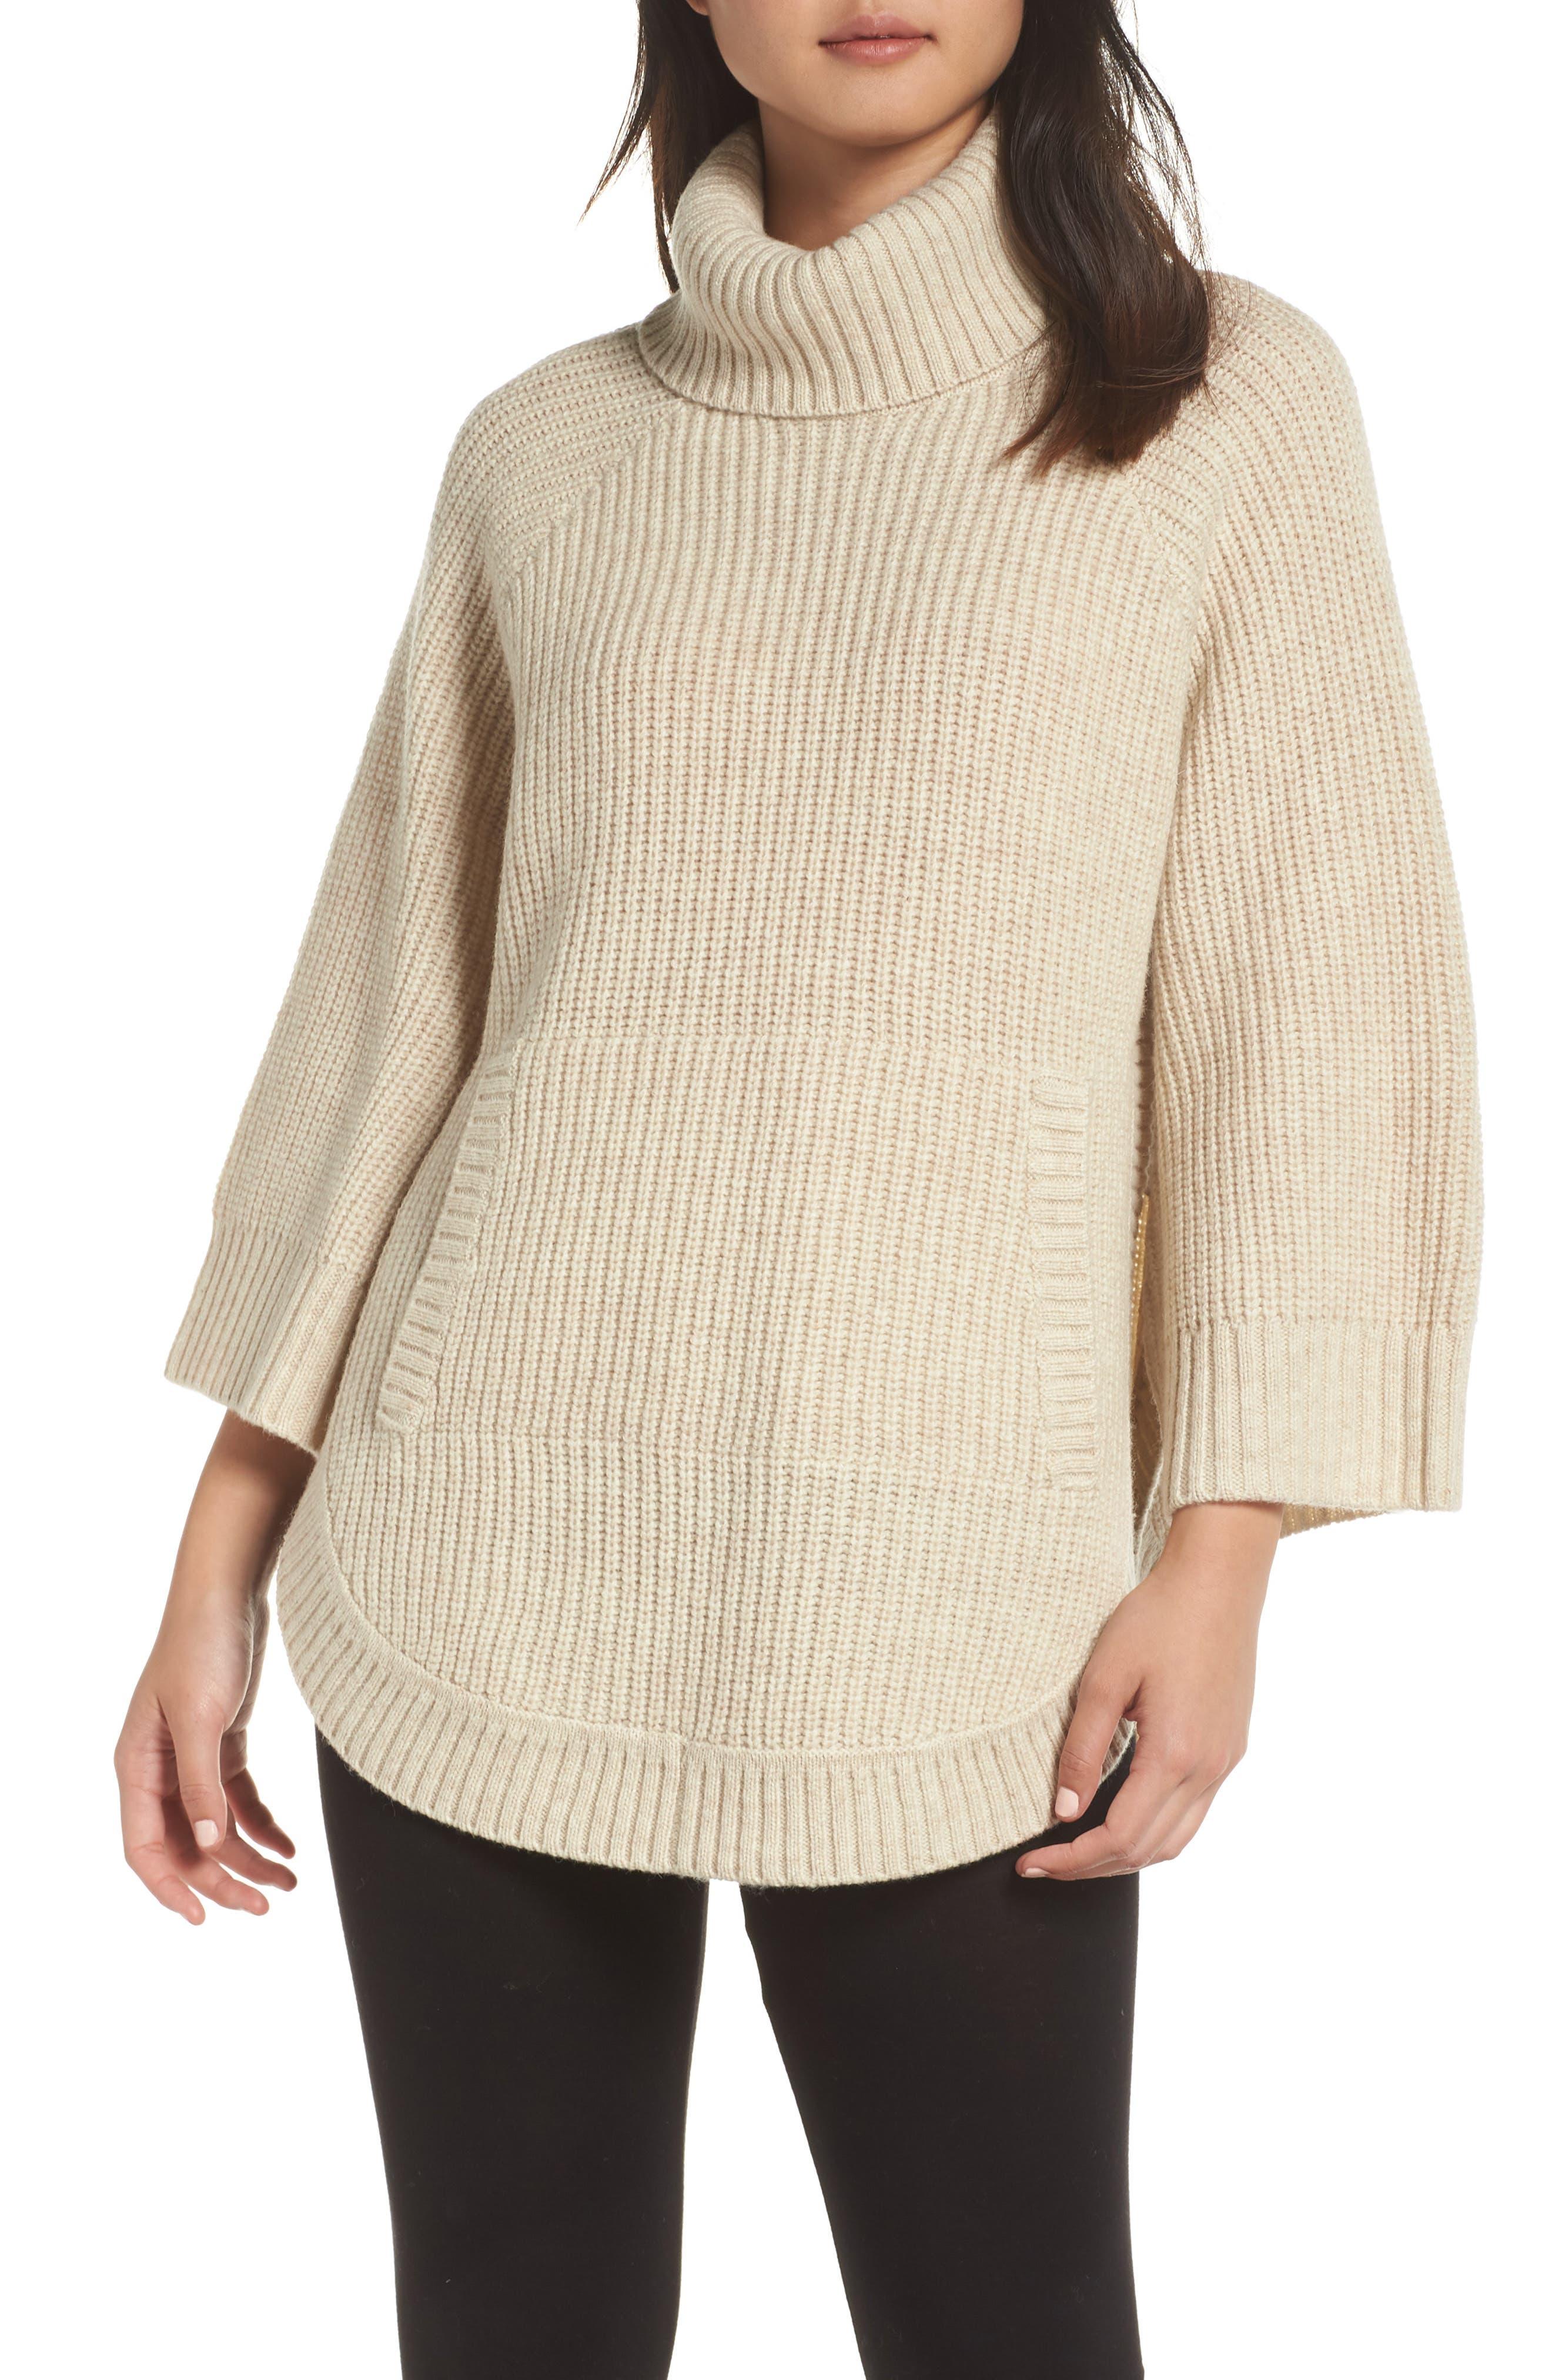 Raelynn Sweater Poncho,                             Main thumbnail 1, color,                             CREAM HEATHER